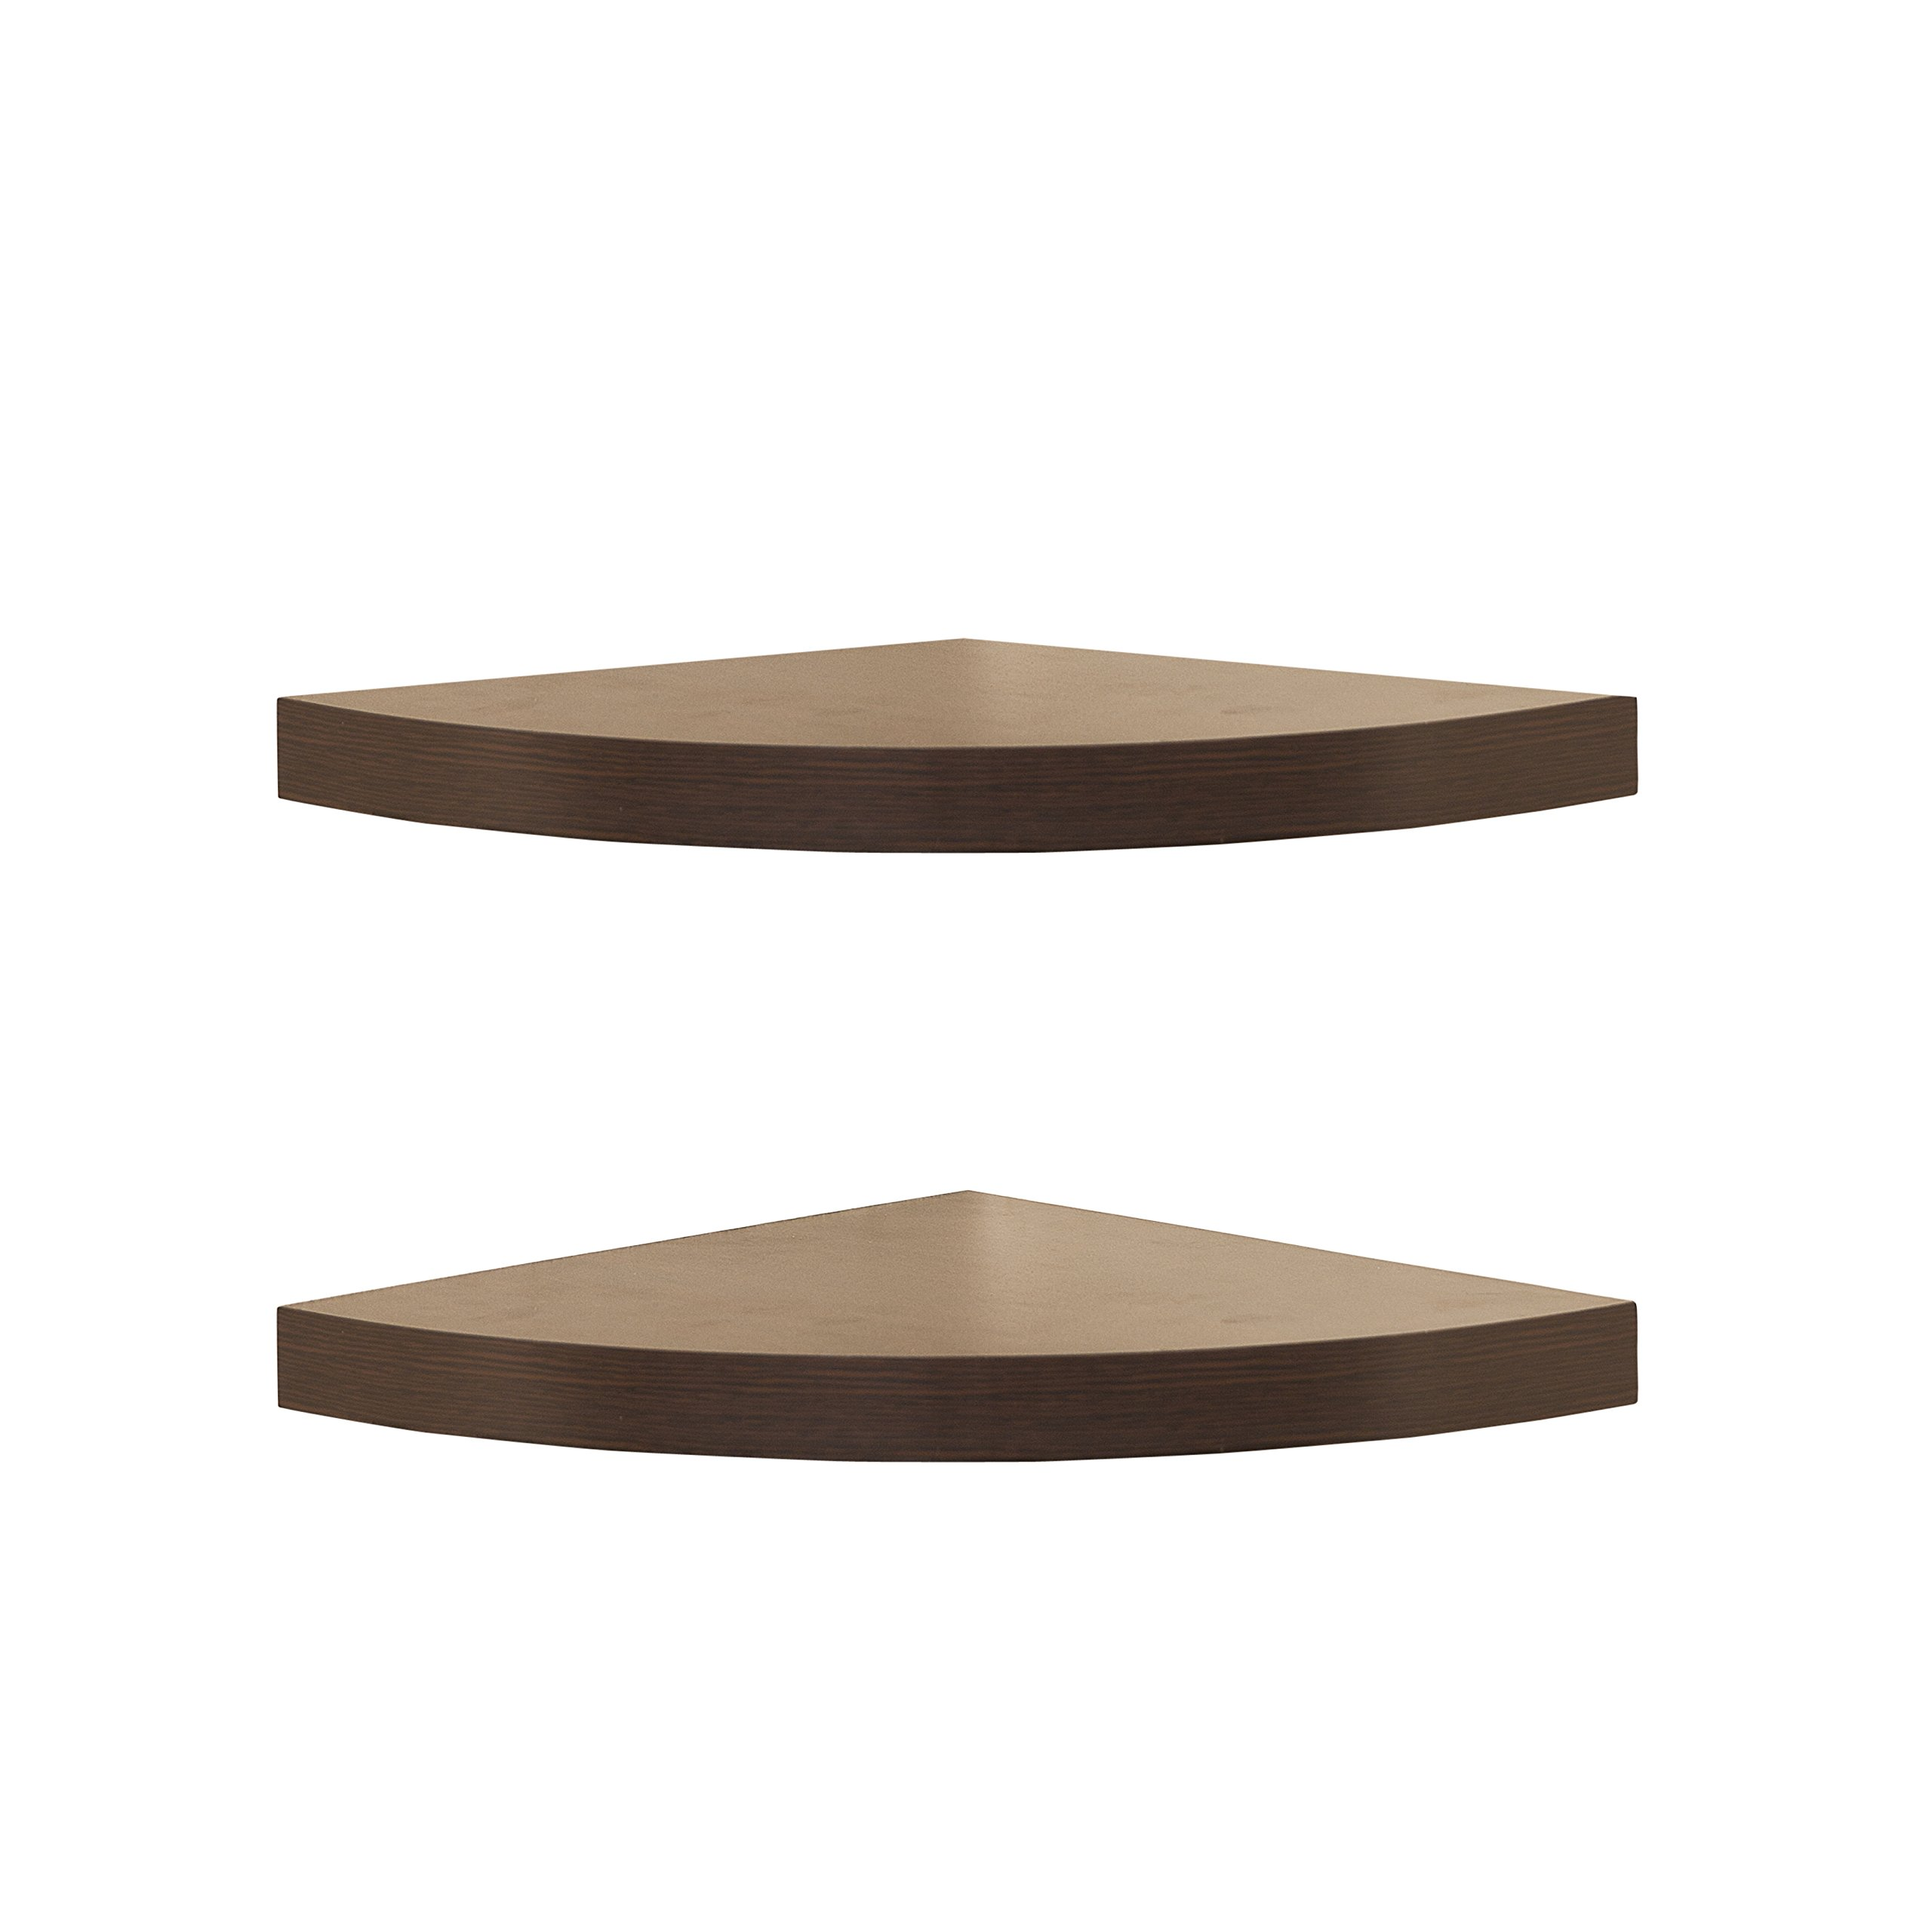 Danya B. XF11115-2 Small Floating Wall Mount Rustic Laminate Wood Corner Wall Radial Shelves (Set of 2) - Walnut